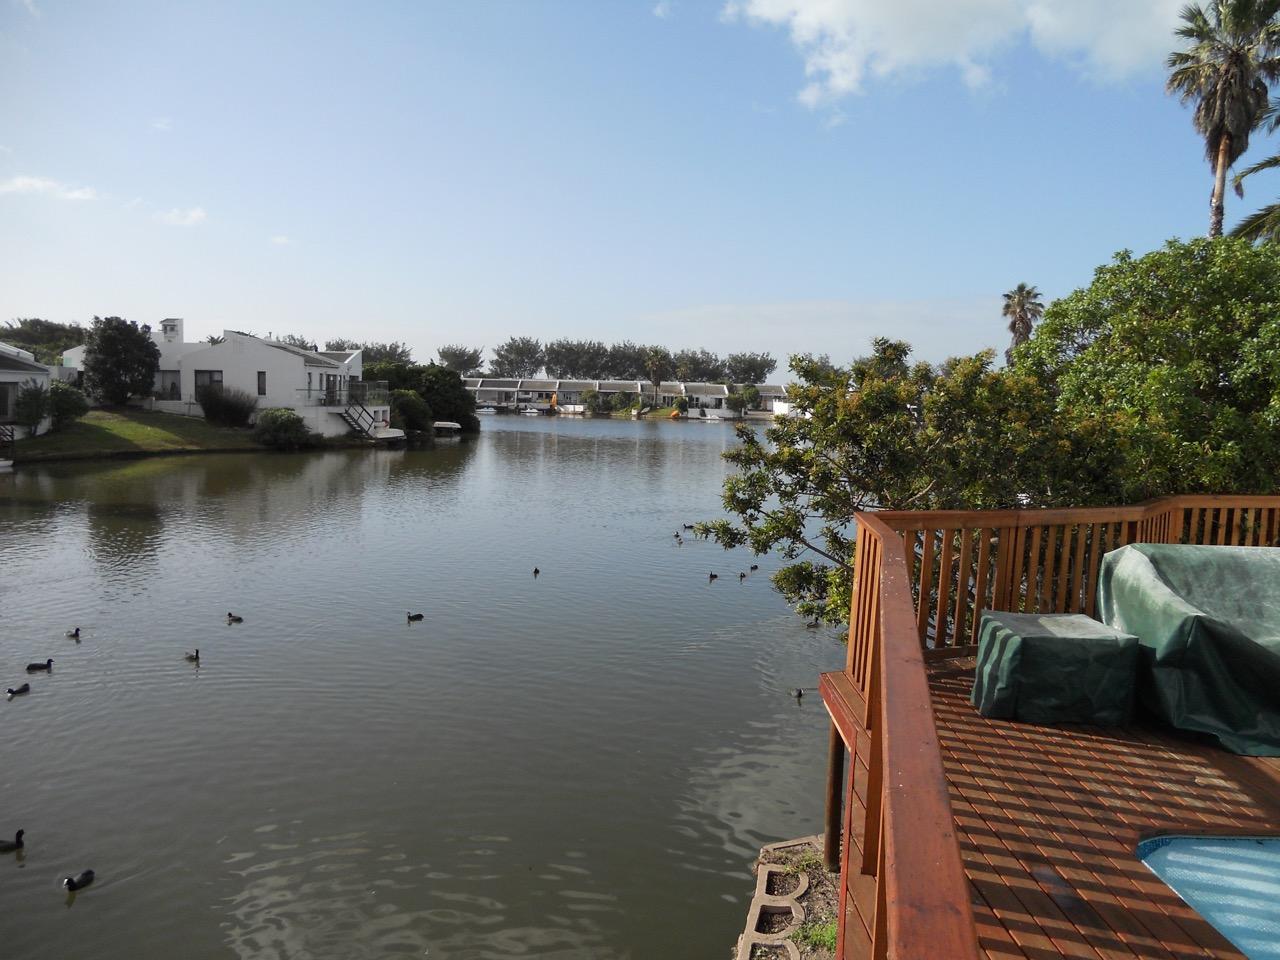 5 BedroomHouse For Sale In Marina Da Gama